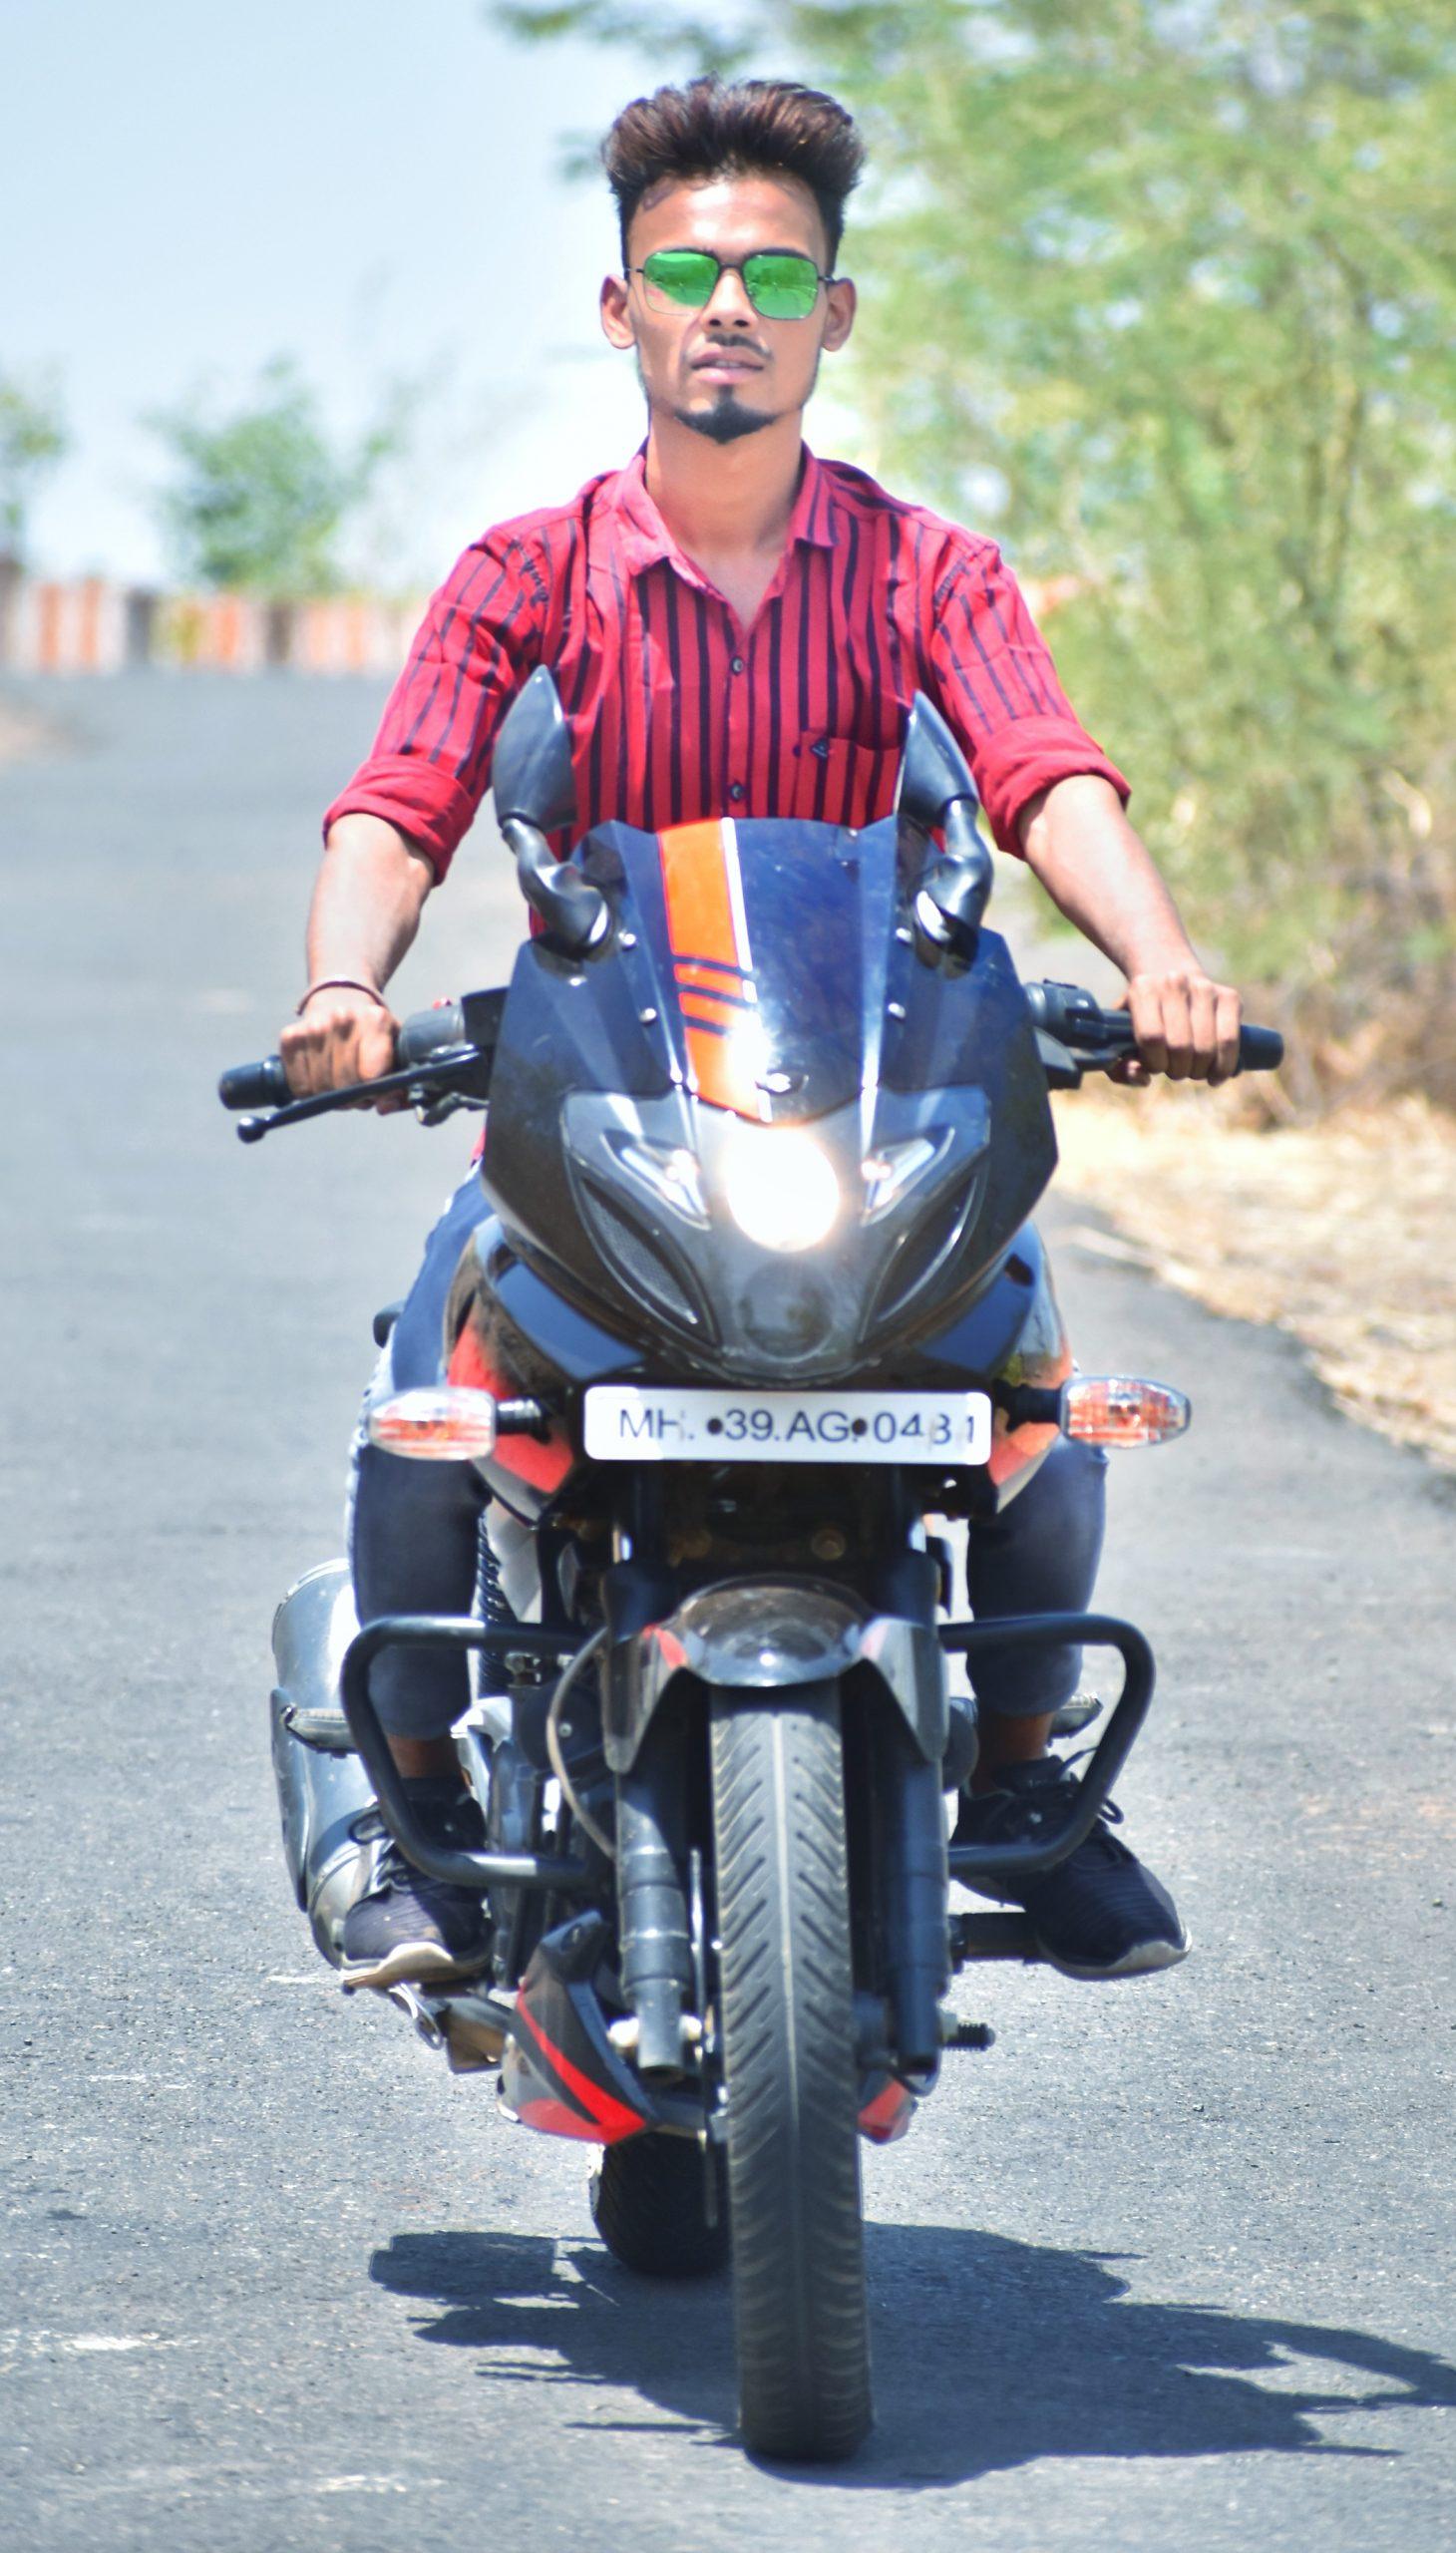 Stylish boy riding pulsar bike